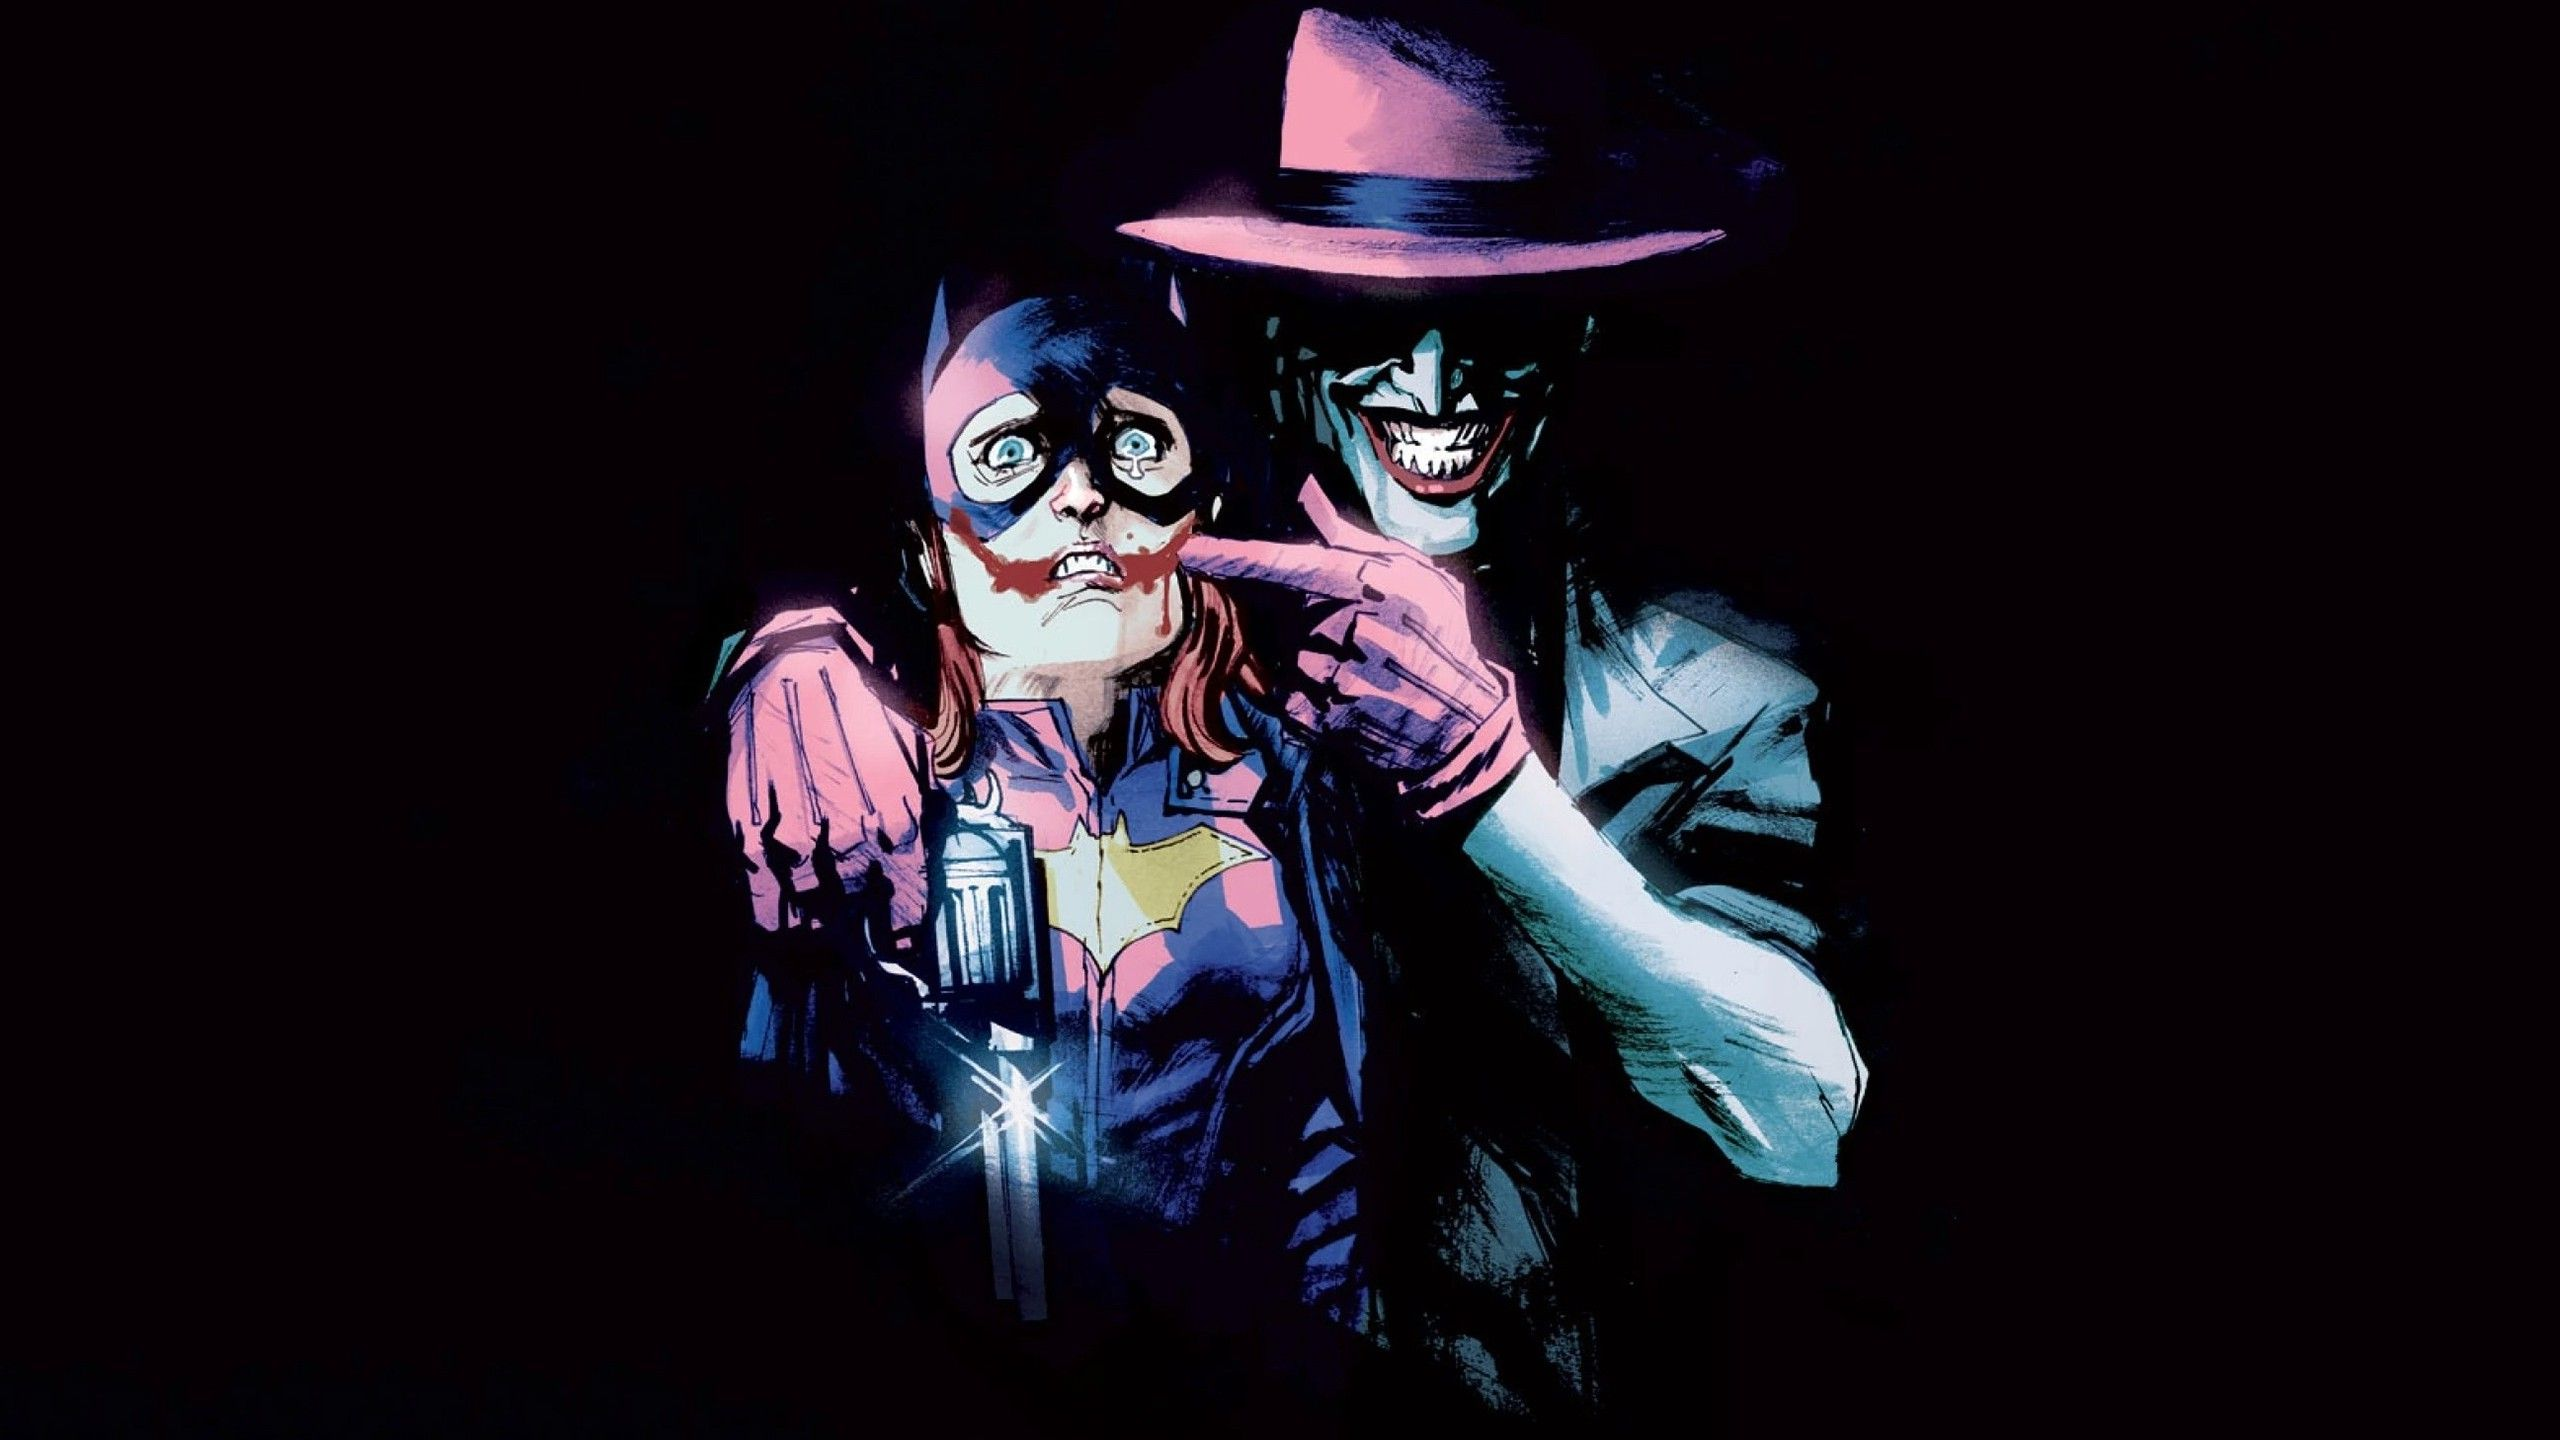 DC Comics Batgirls Joker Wallpaper 2560x1440